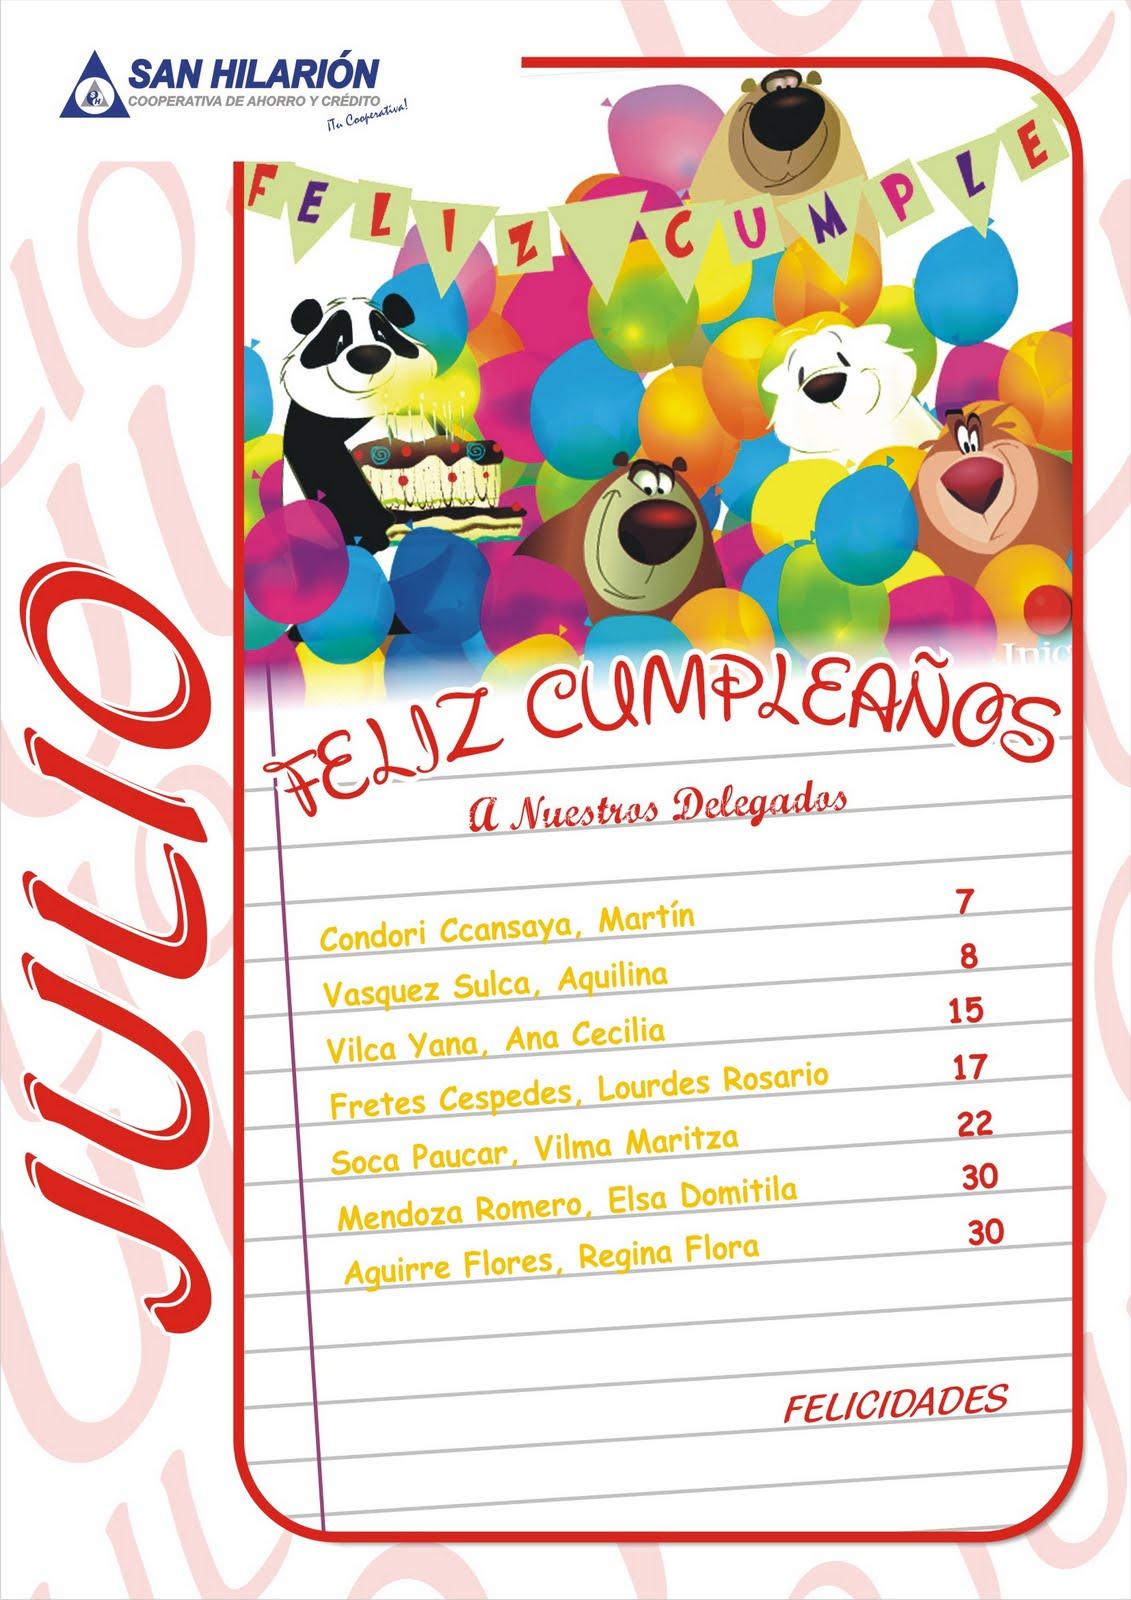 Cooperativa san hilari n julio feliz cumplea os a for Alberca 8 de julio